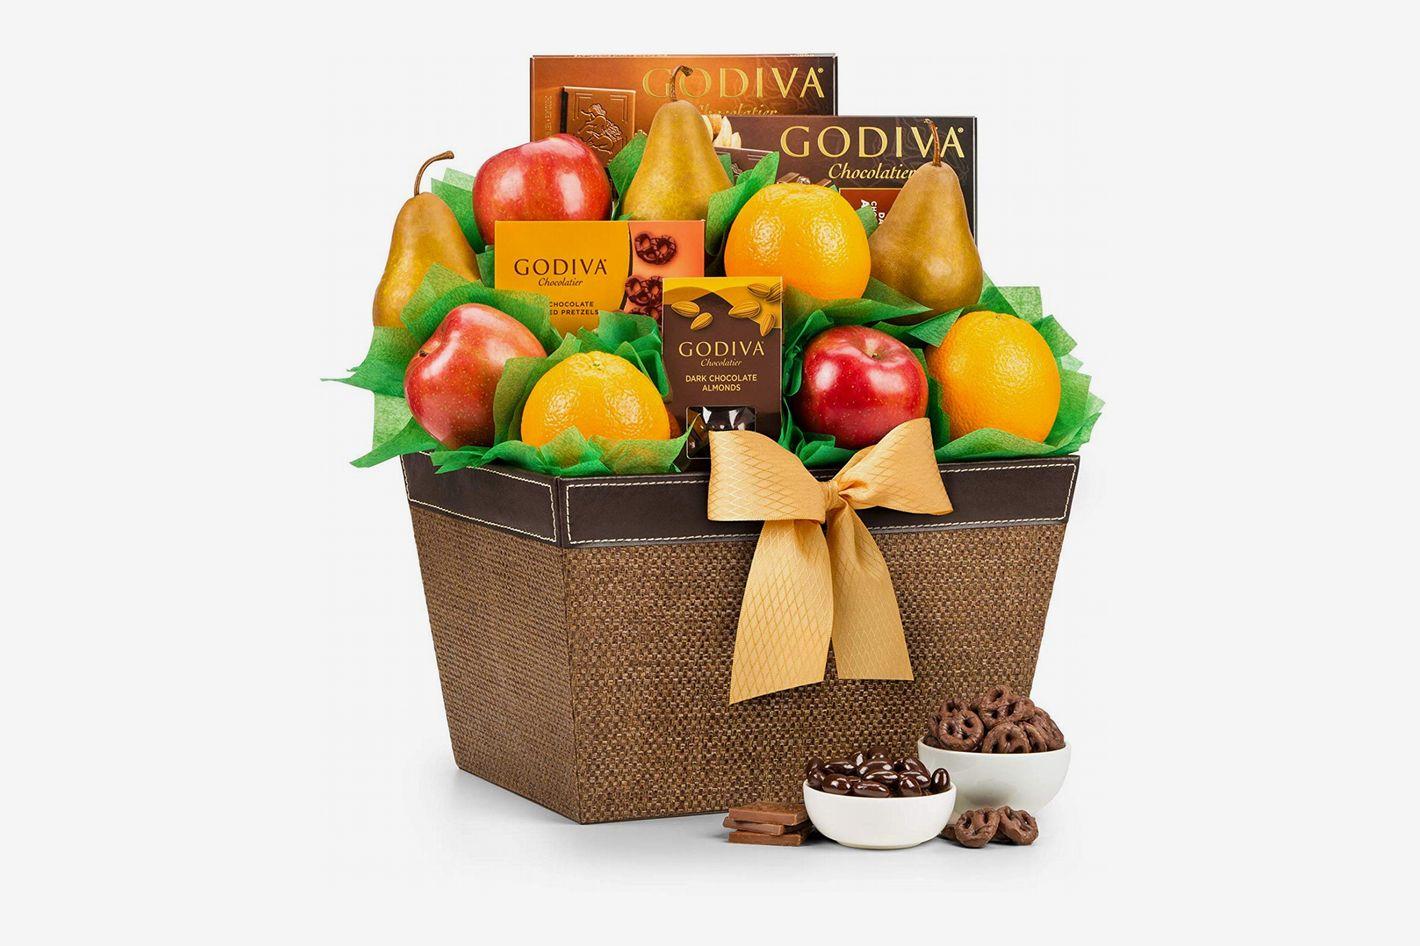 GiftTree Fresh Fruit & Godiva Chocolate Gift Basket